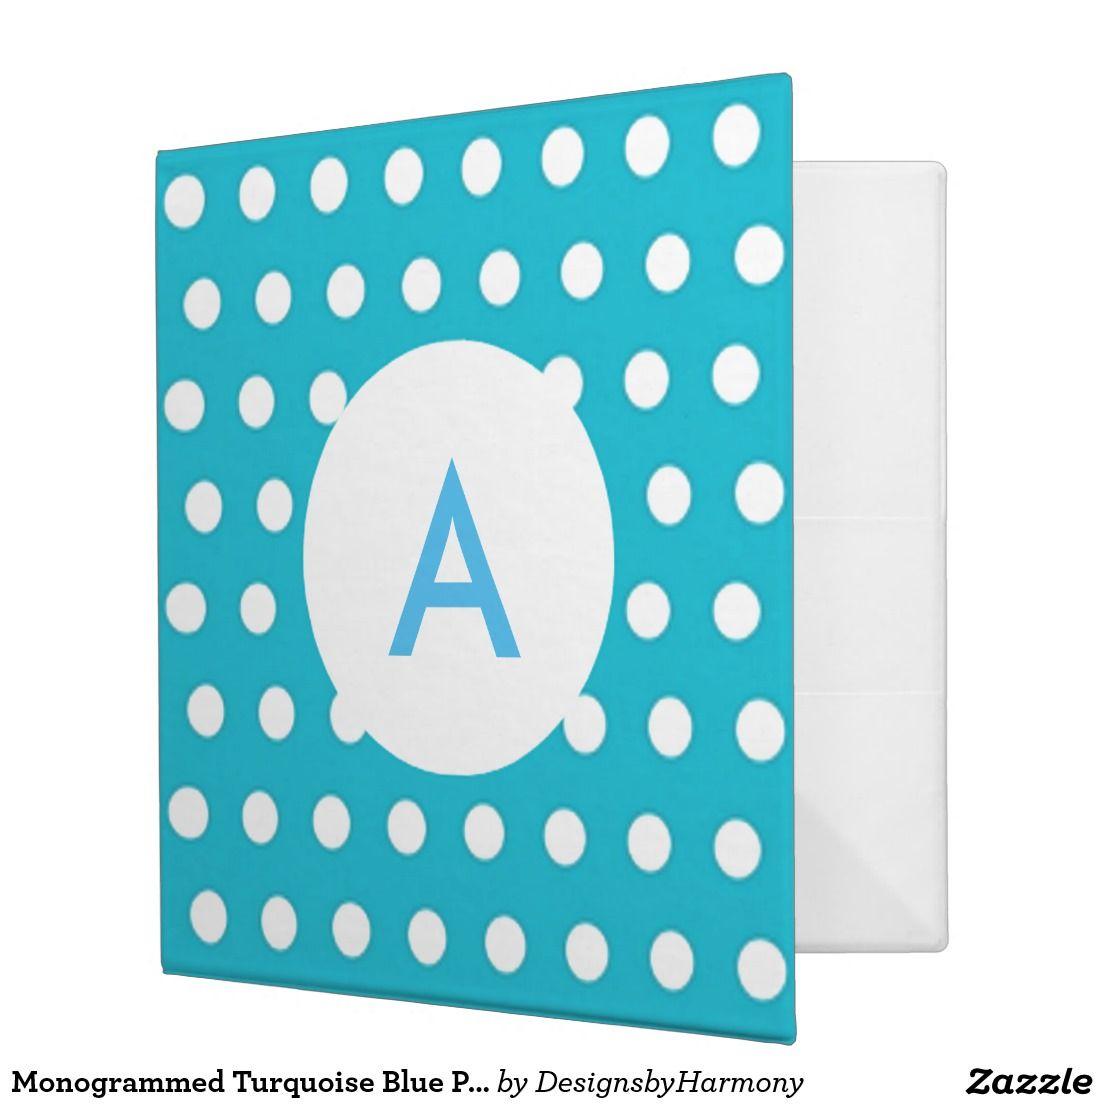 Monogrammed Turquoise Blue Polka Dots 3 Ring Binder